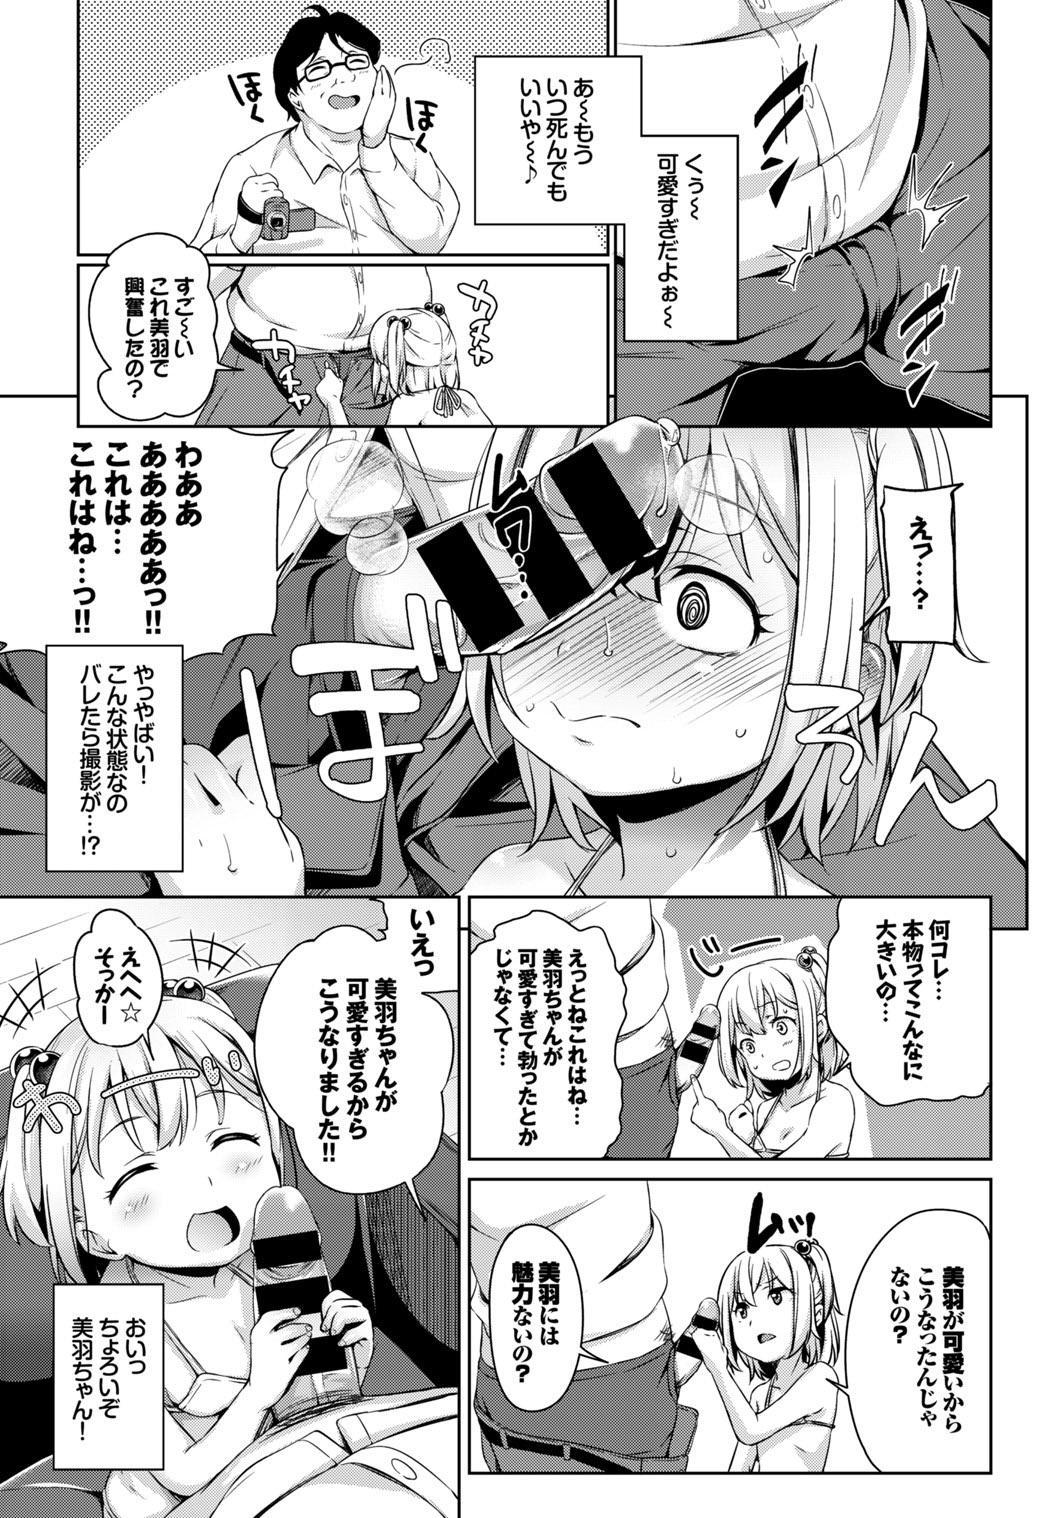 Yappari Mizugi Bishoujo ga Suki Vol. 2 54